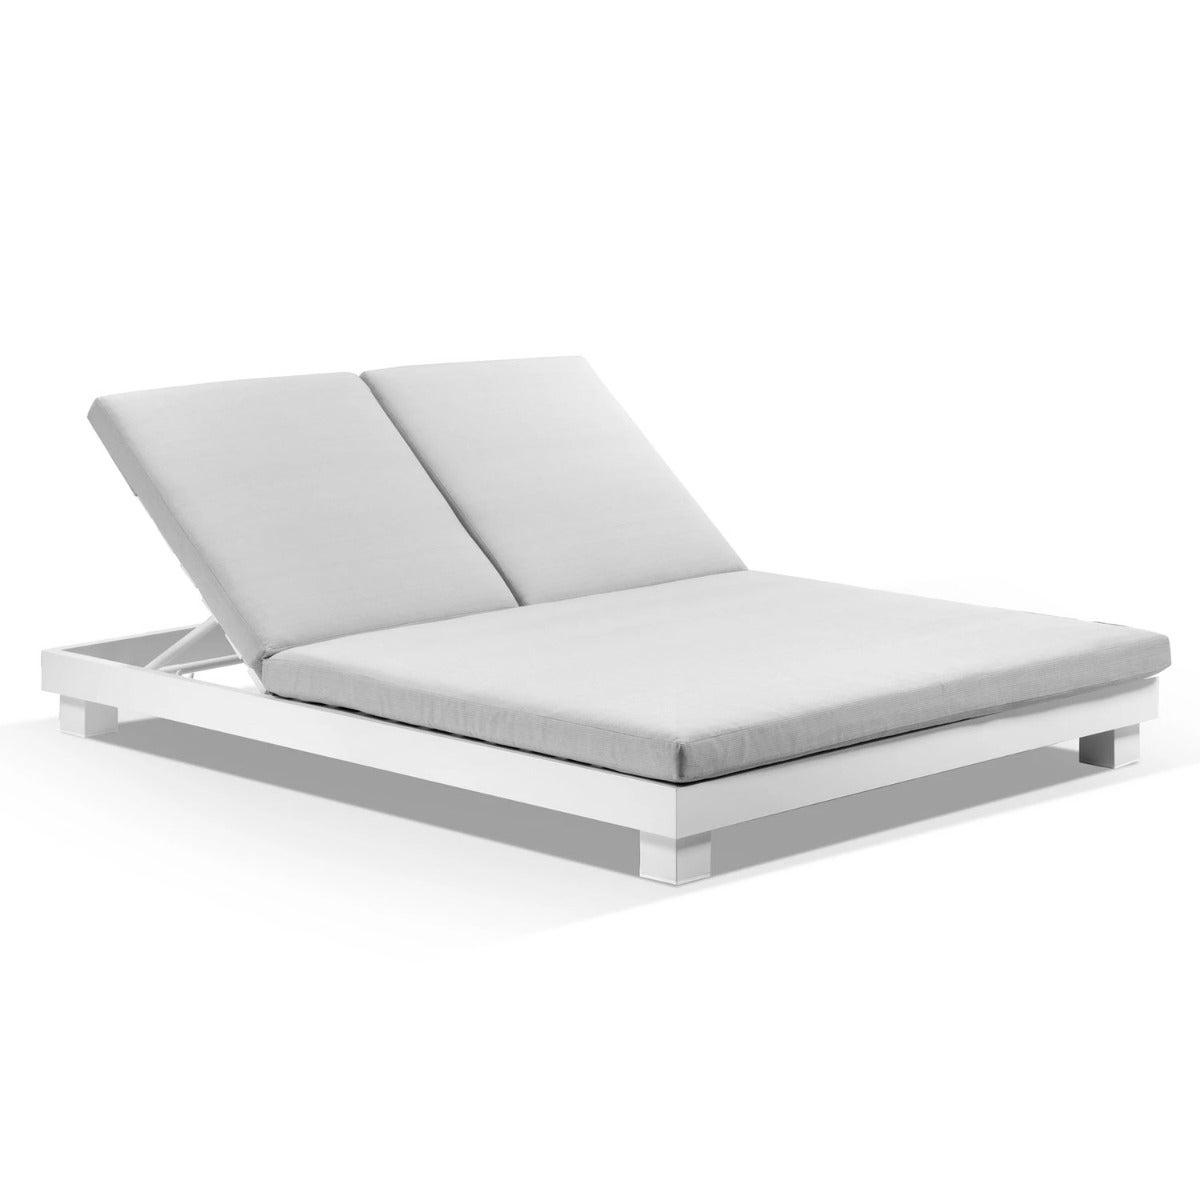 Santorini Aluminium Double Sun Lounge In White